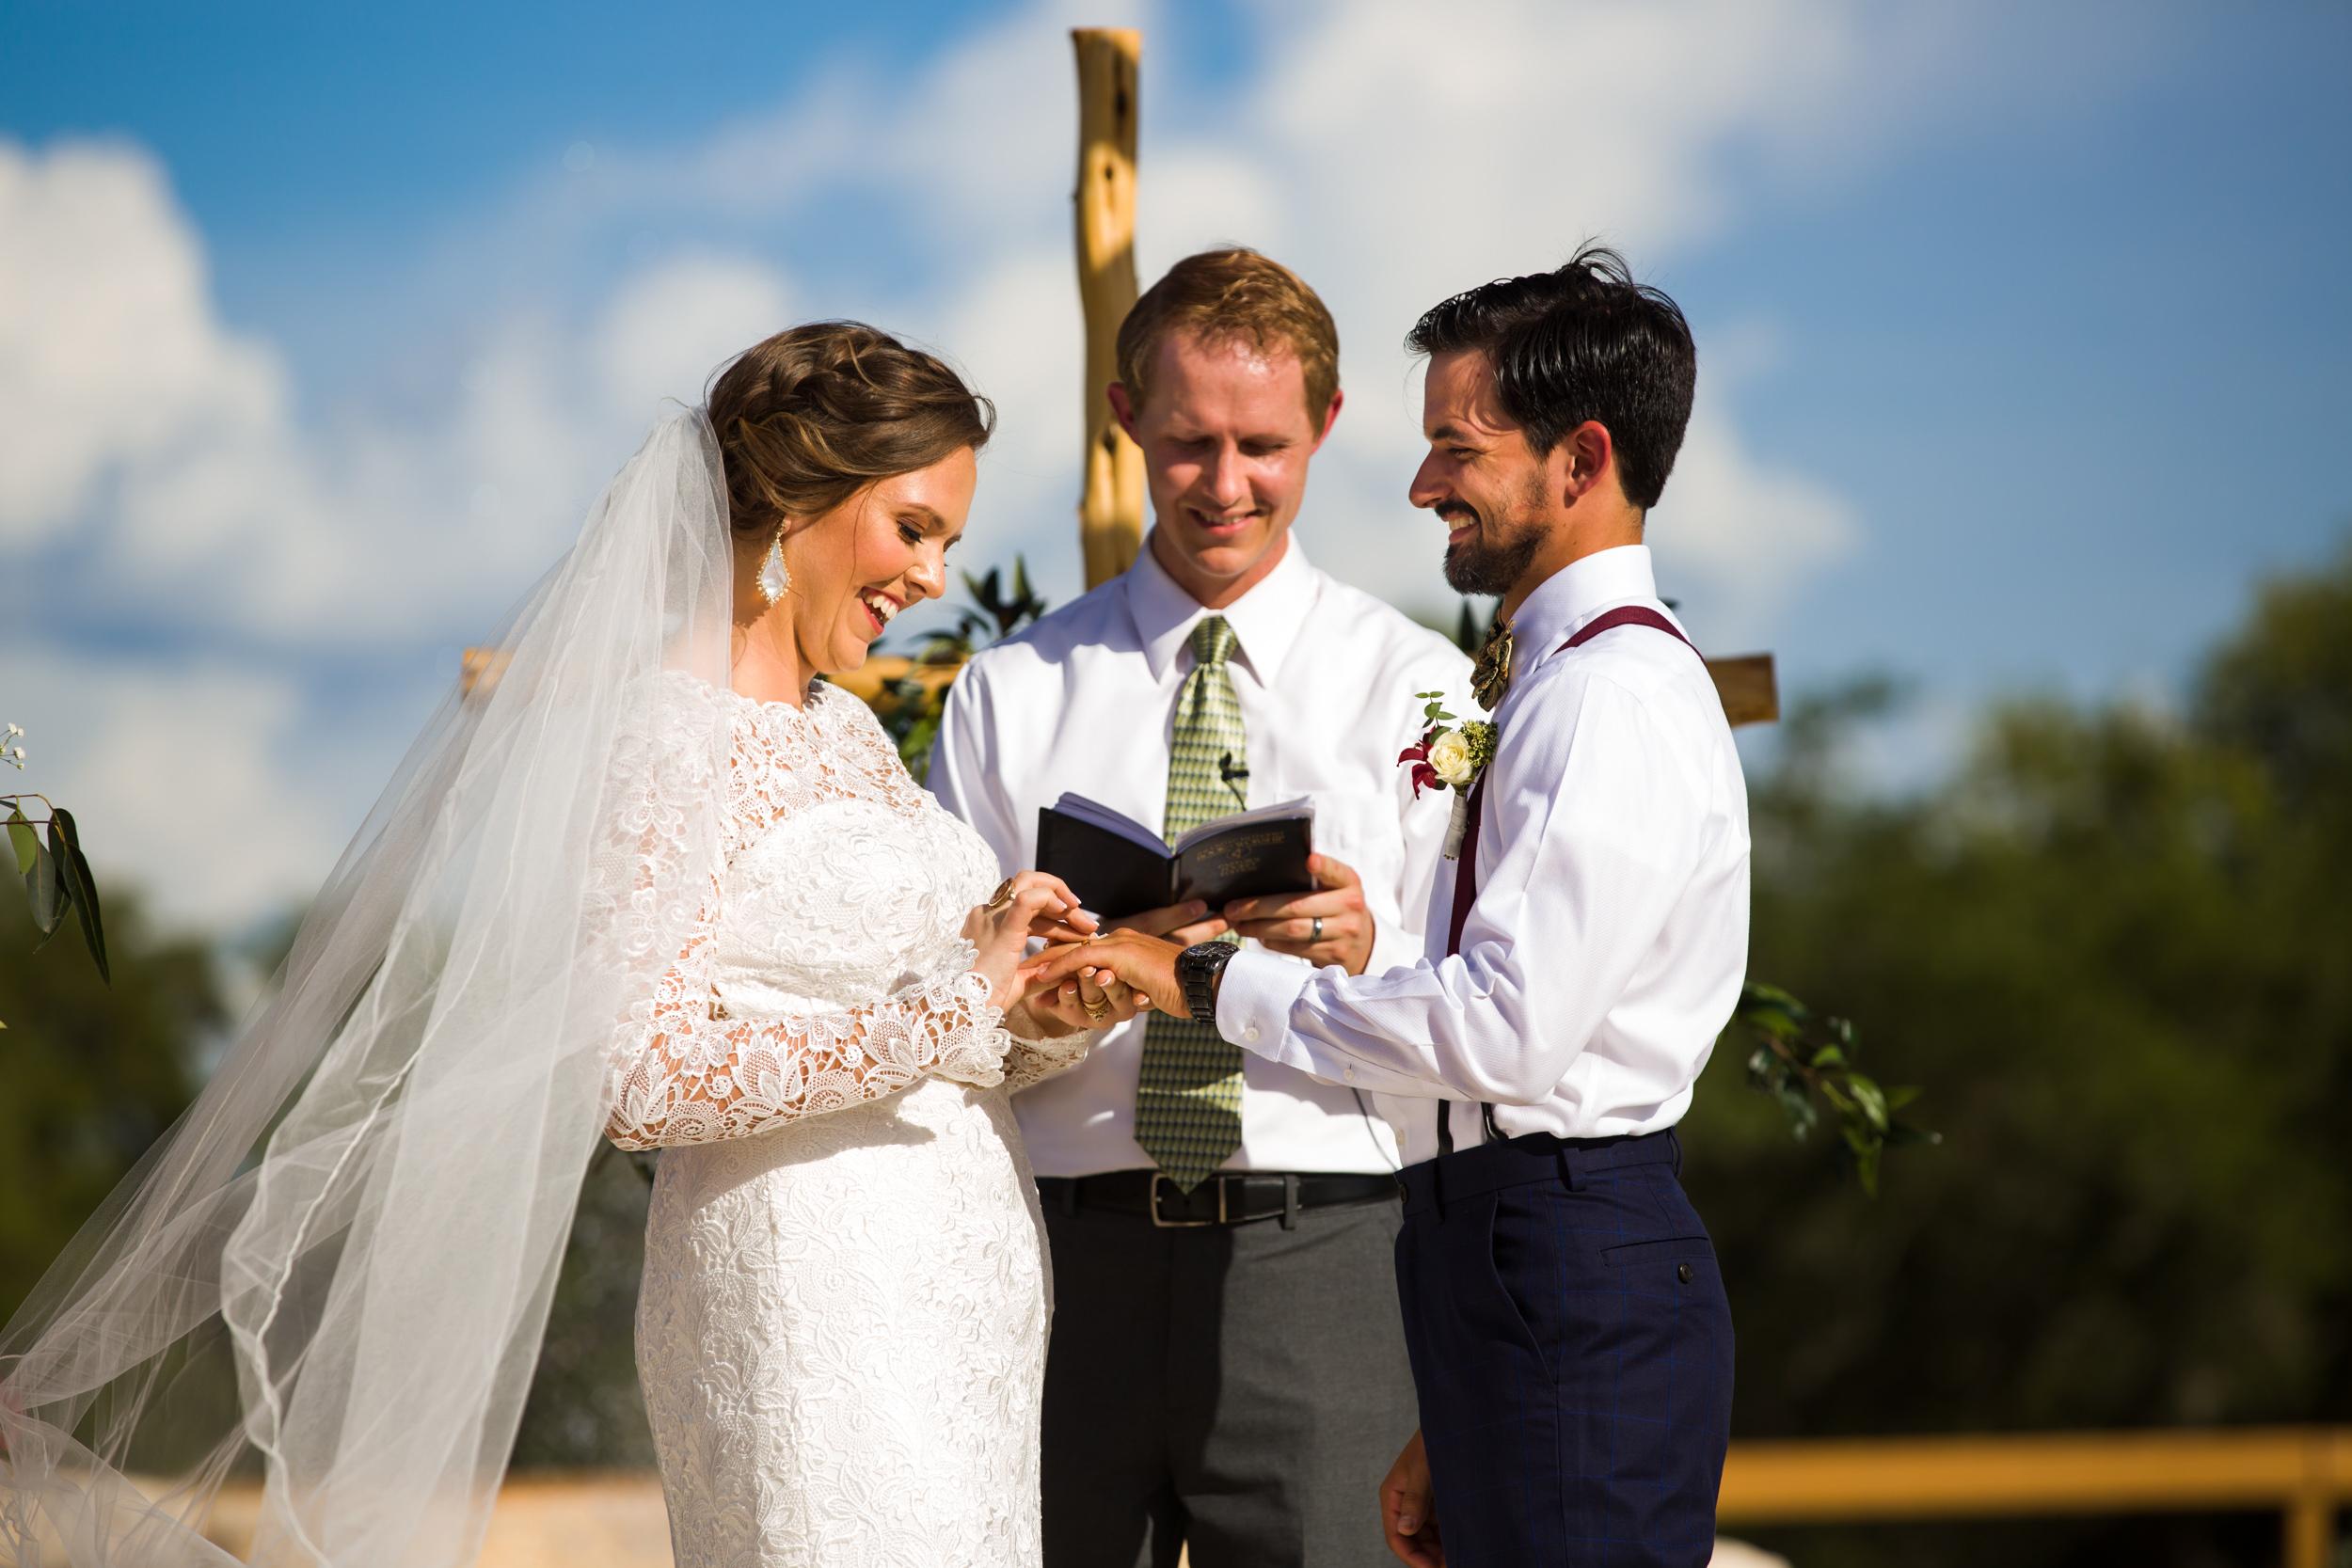 austin-wedding-colorful-28.jpg